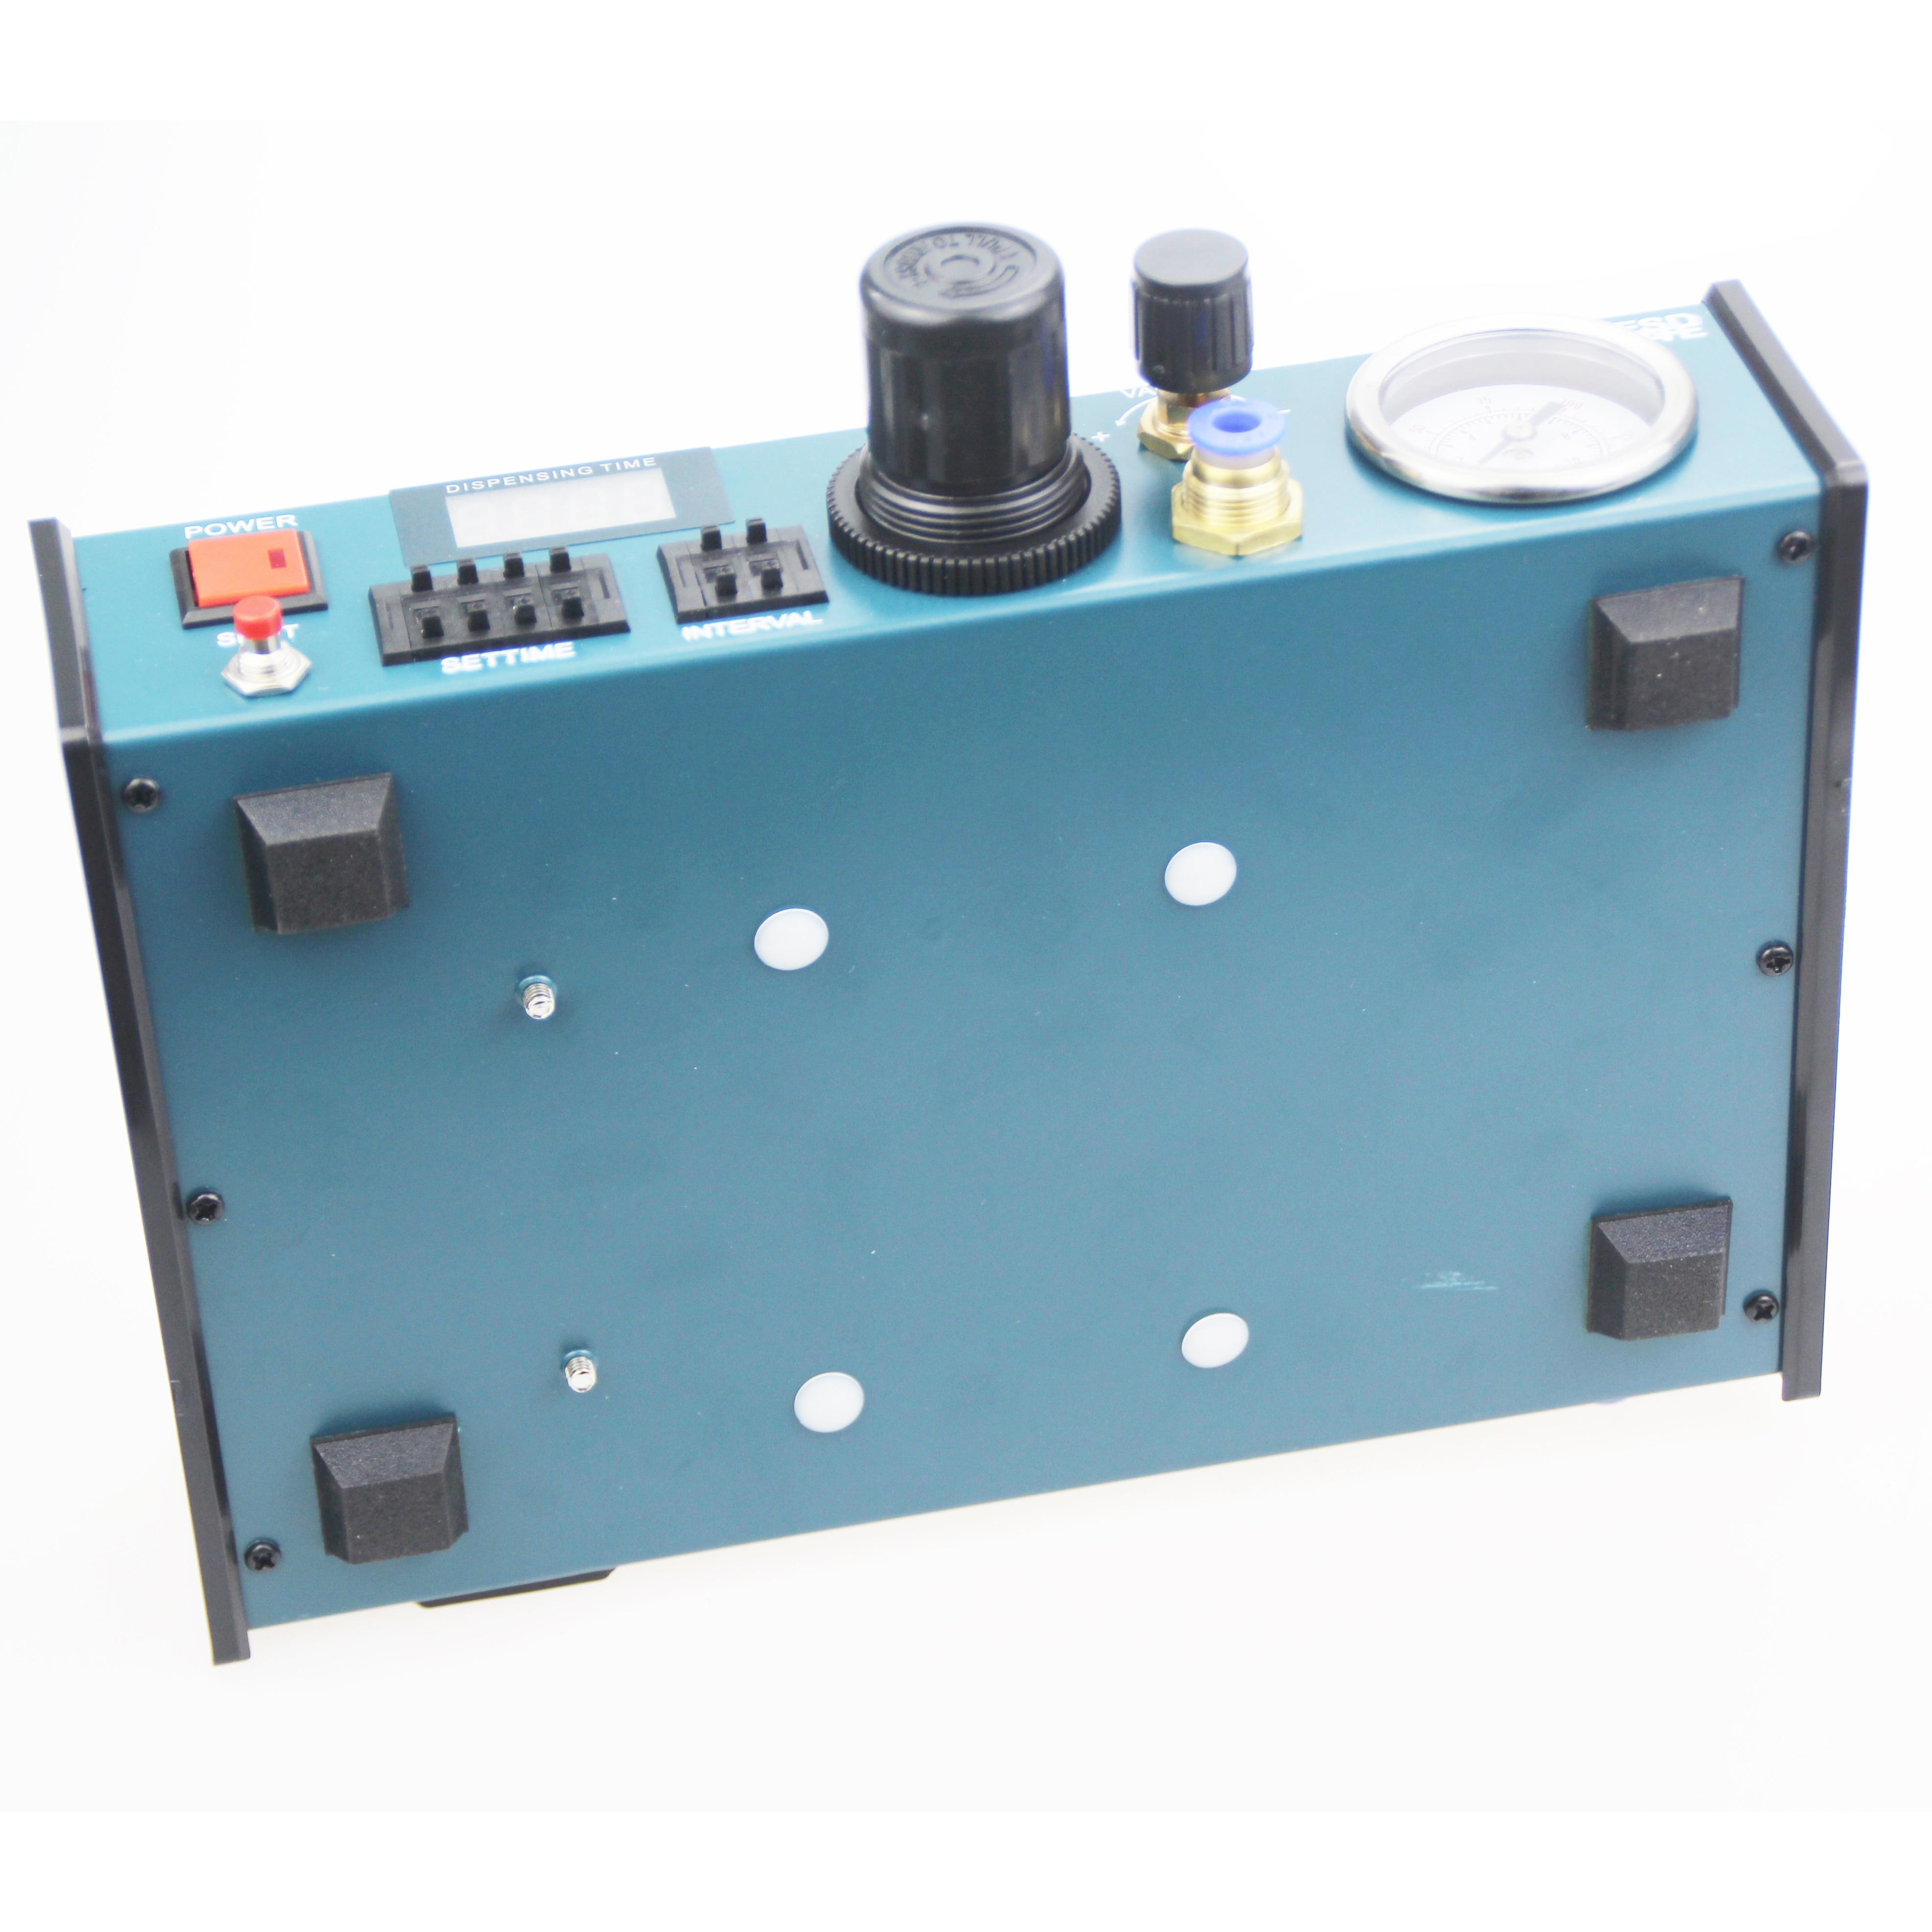 Tools : Free shipping VBP-983A Professional Precise Digital Auto Glue Dispenser Solder Paste Liquid Controller Dropper 220V